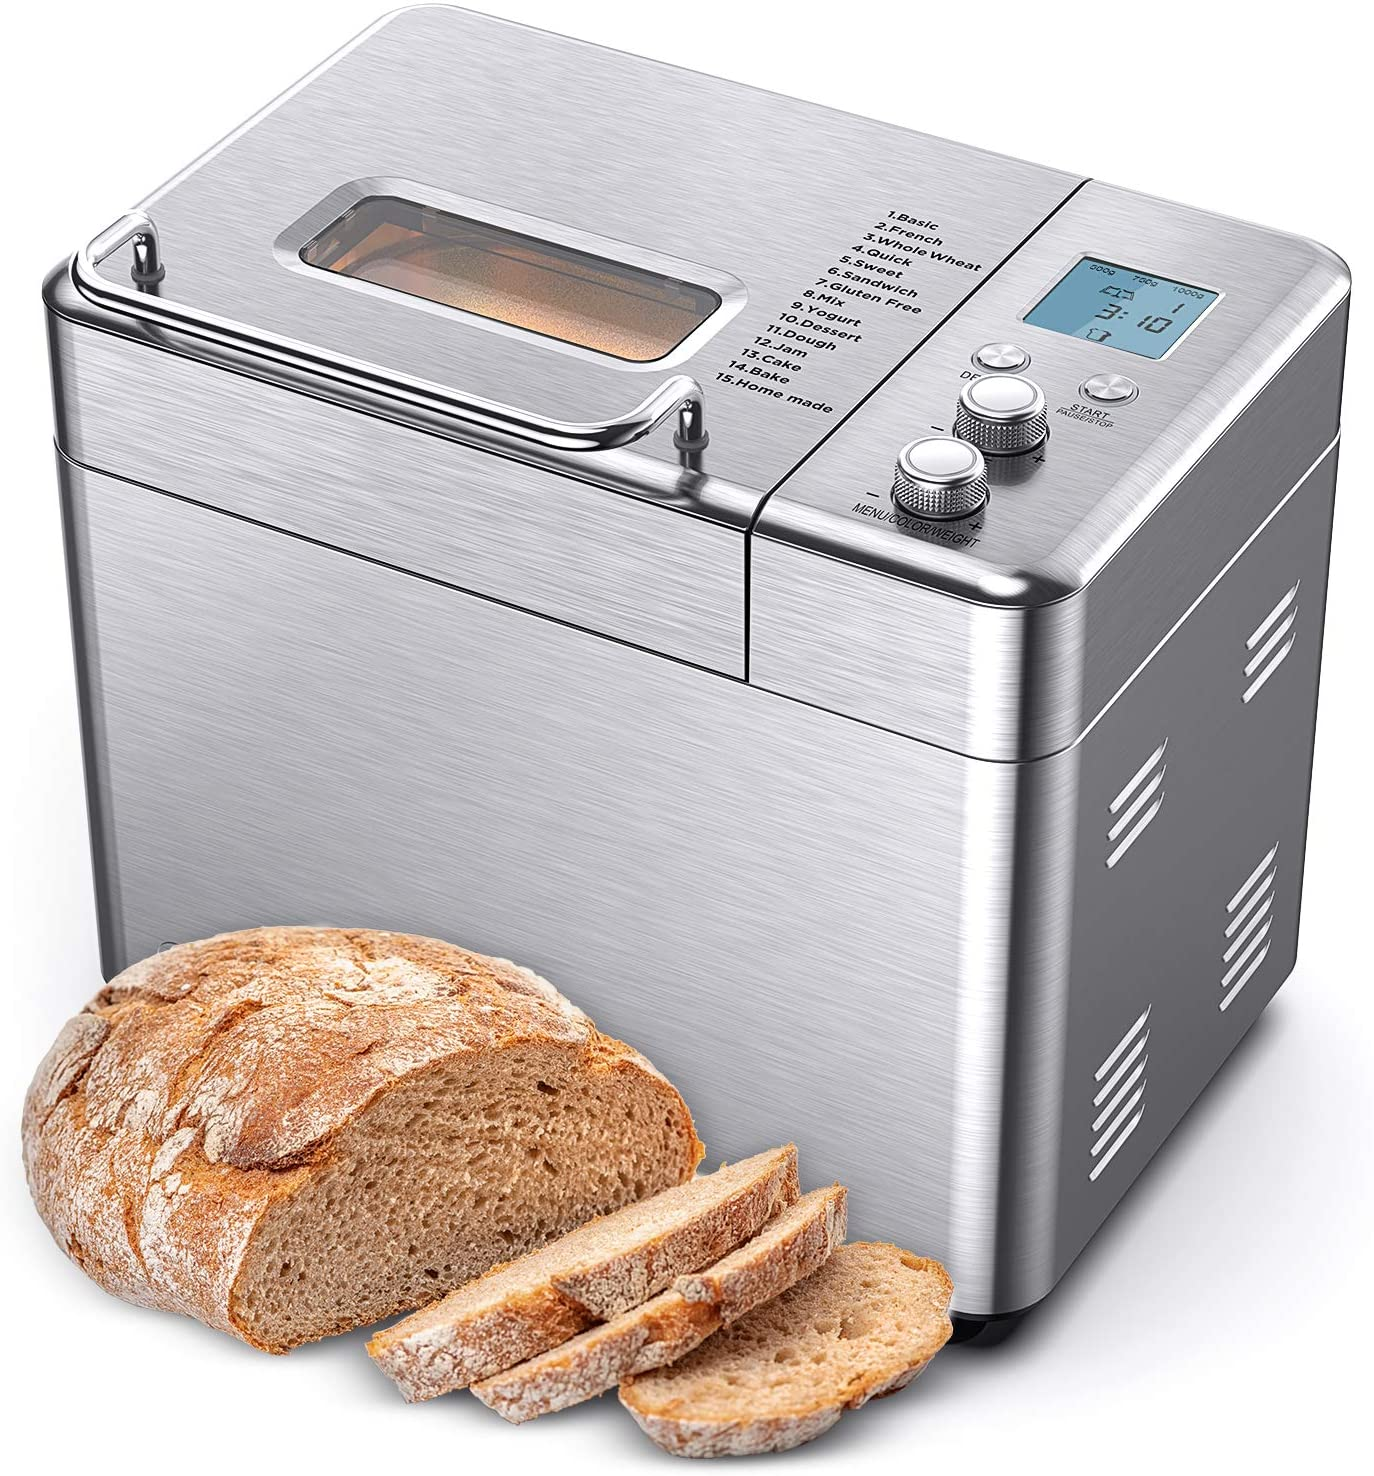 10 Най-добри хлебопекарни